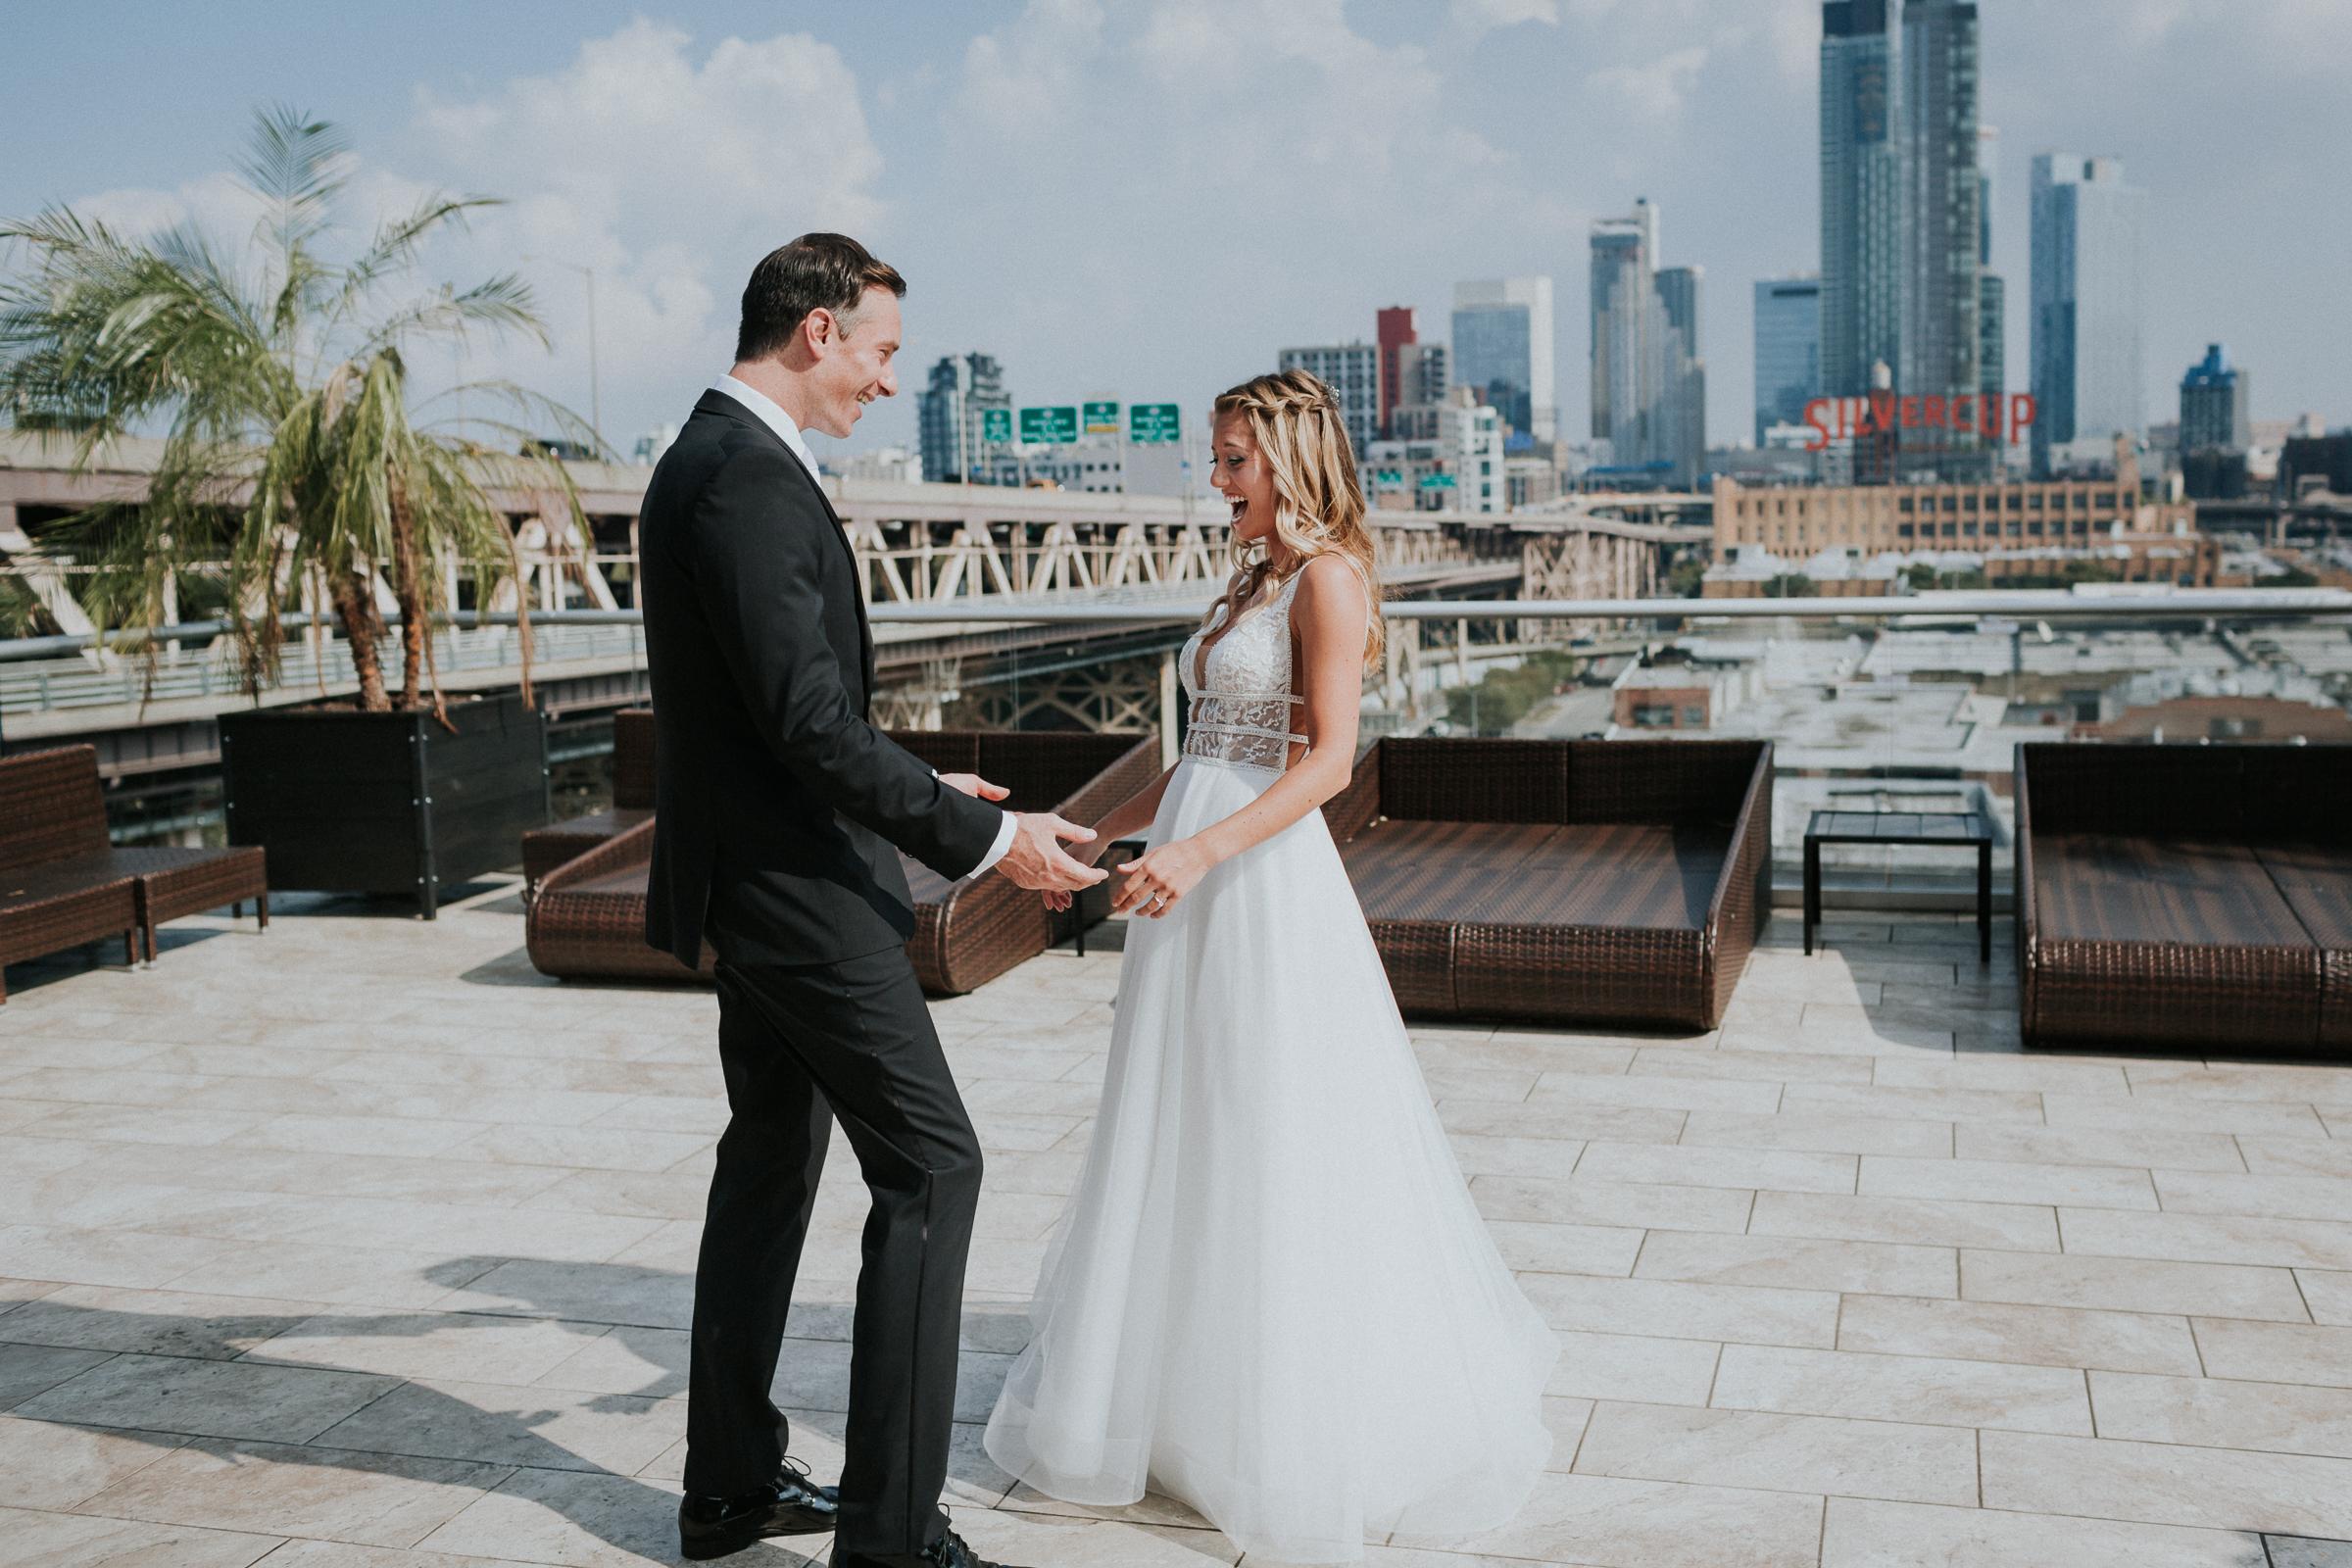 Ravel-Hotel-Penthouse-808-Long-Island-City-New-York-Documentary-Wedding-Photographer-21.jpg